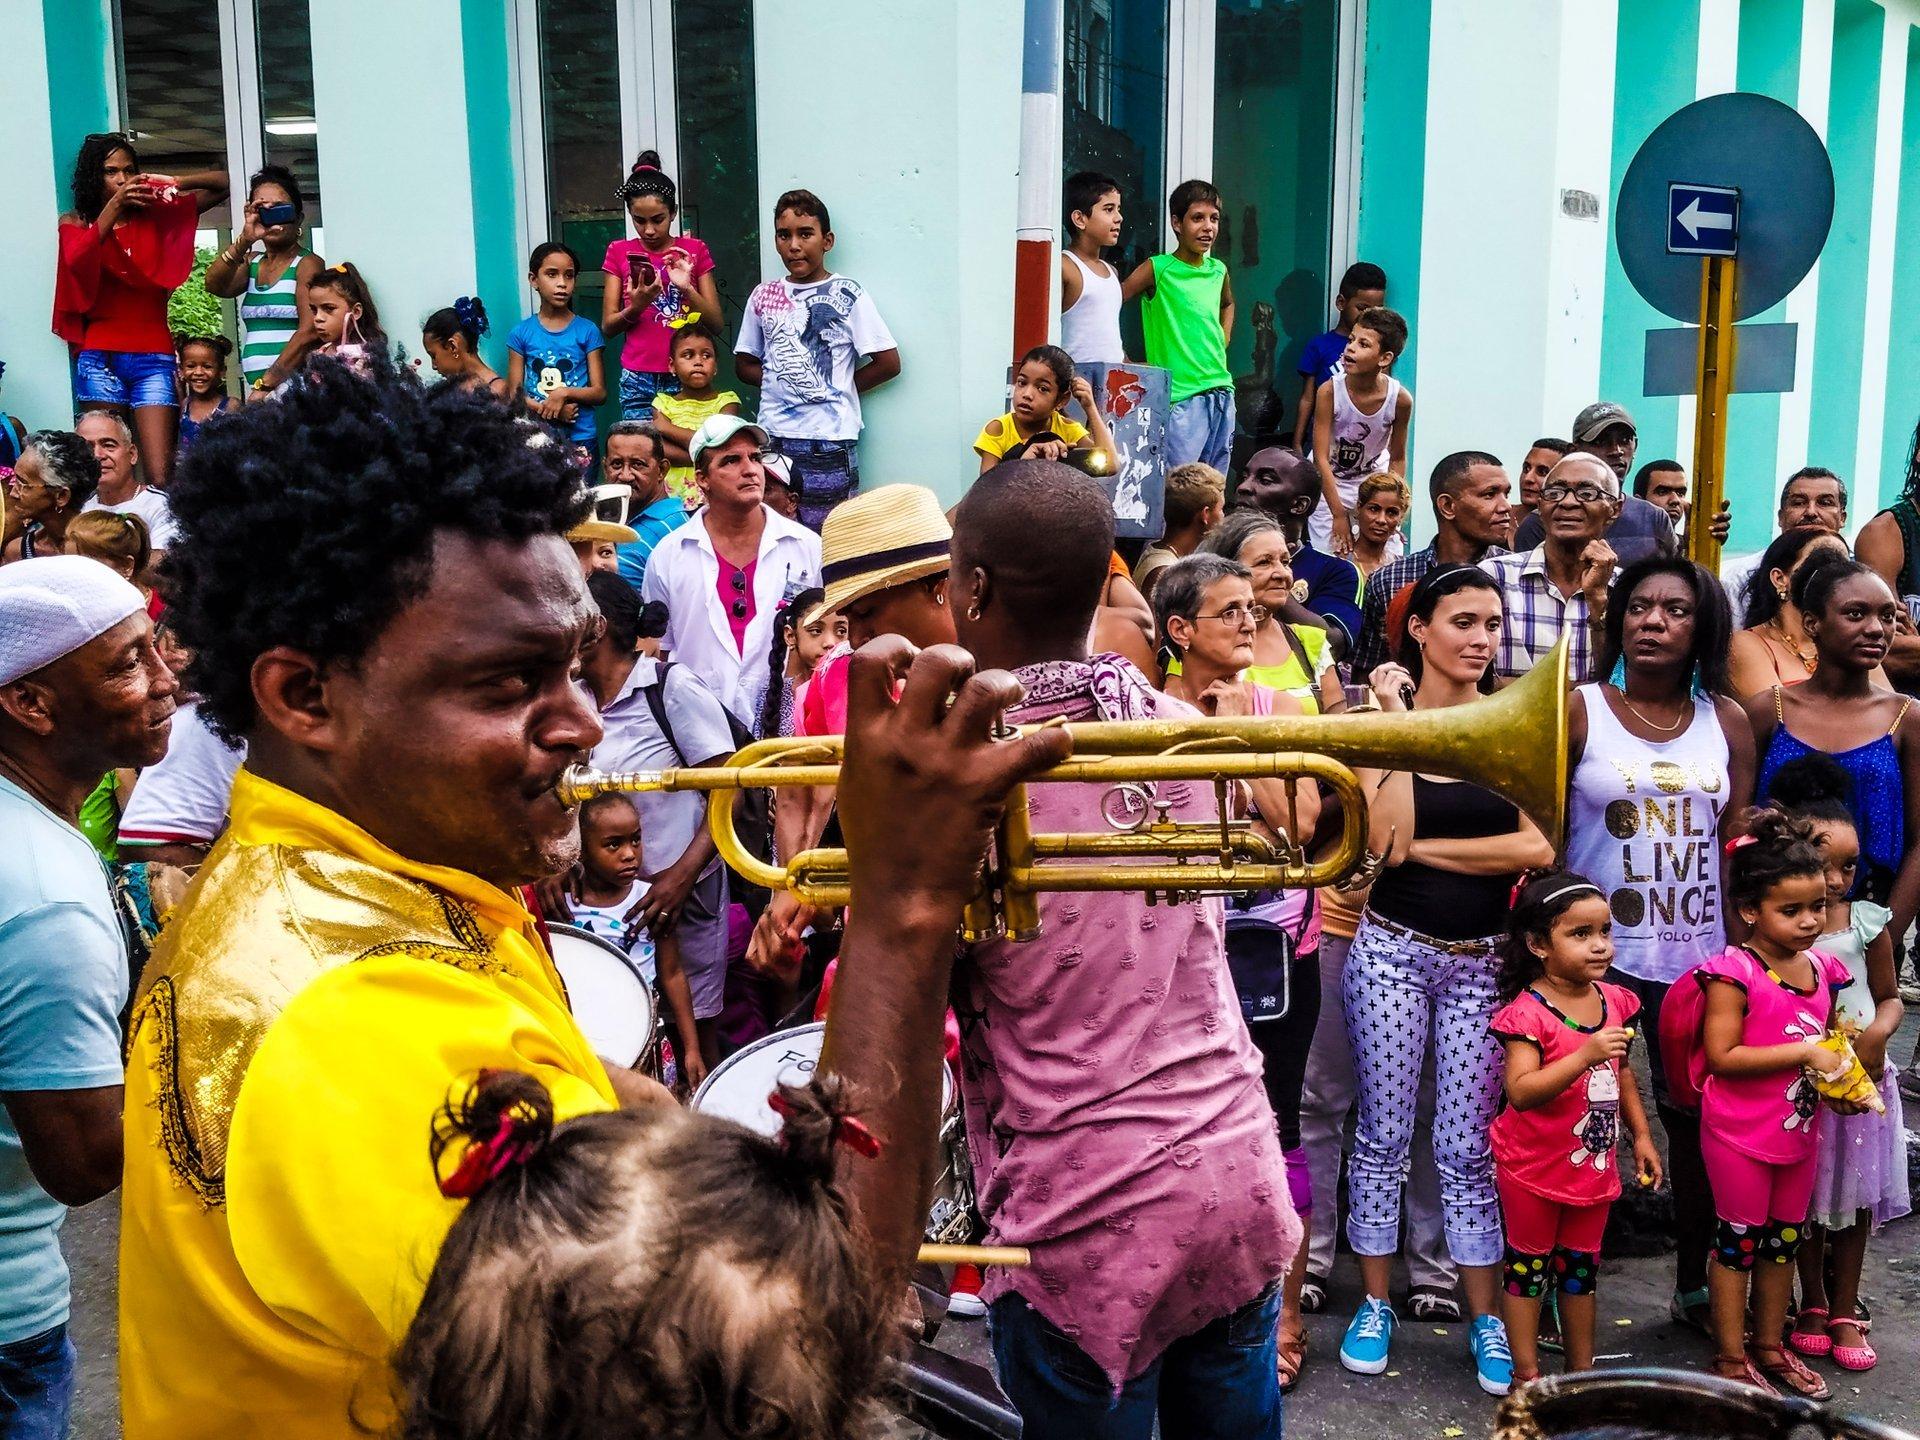 Fiesta del Fuego | Festival of the Caribe in Cuba 2019 - Best Time